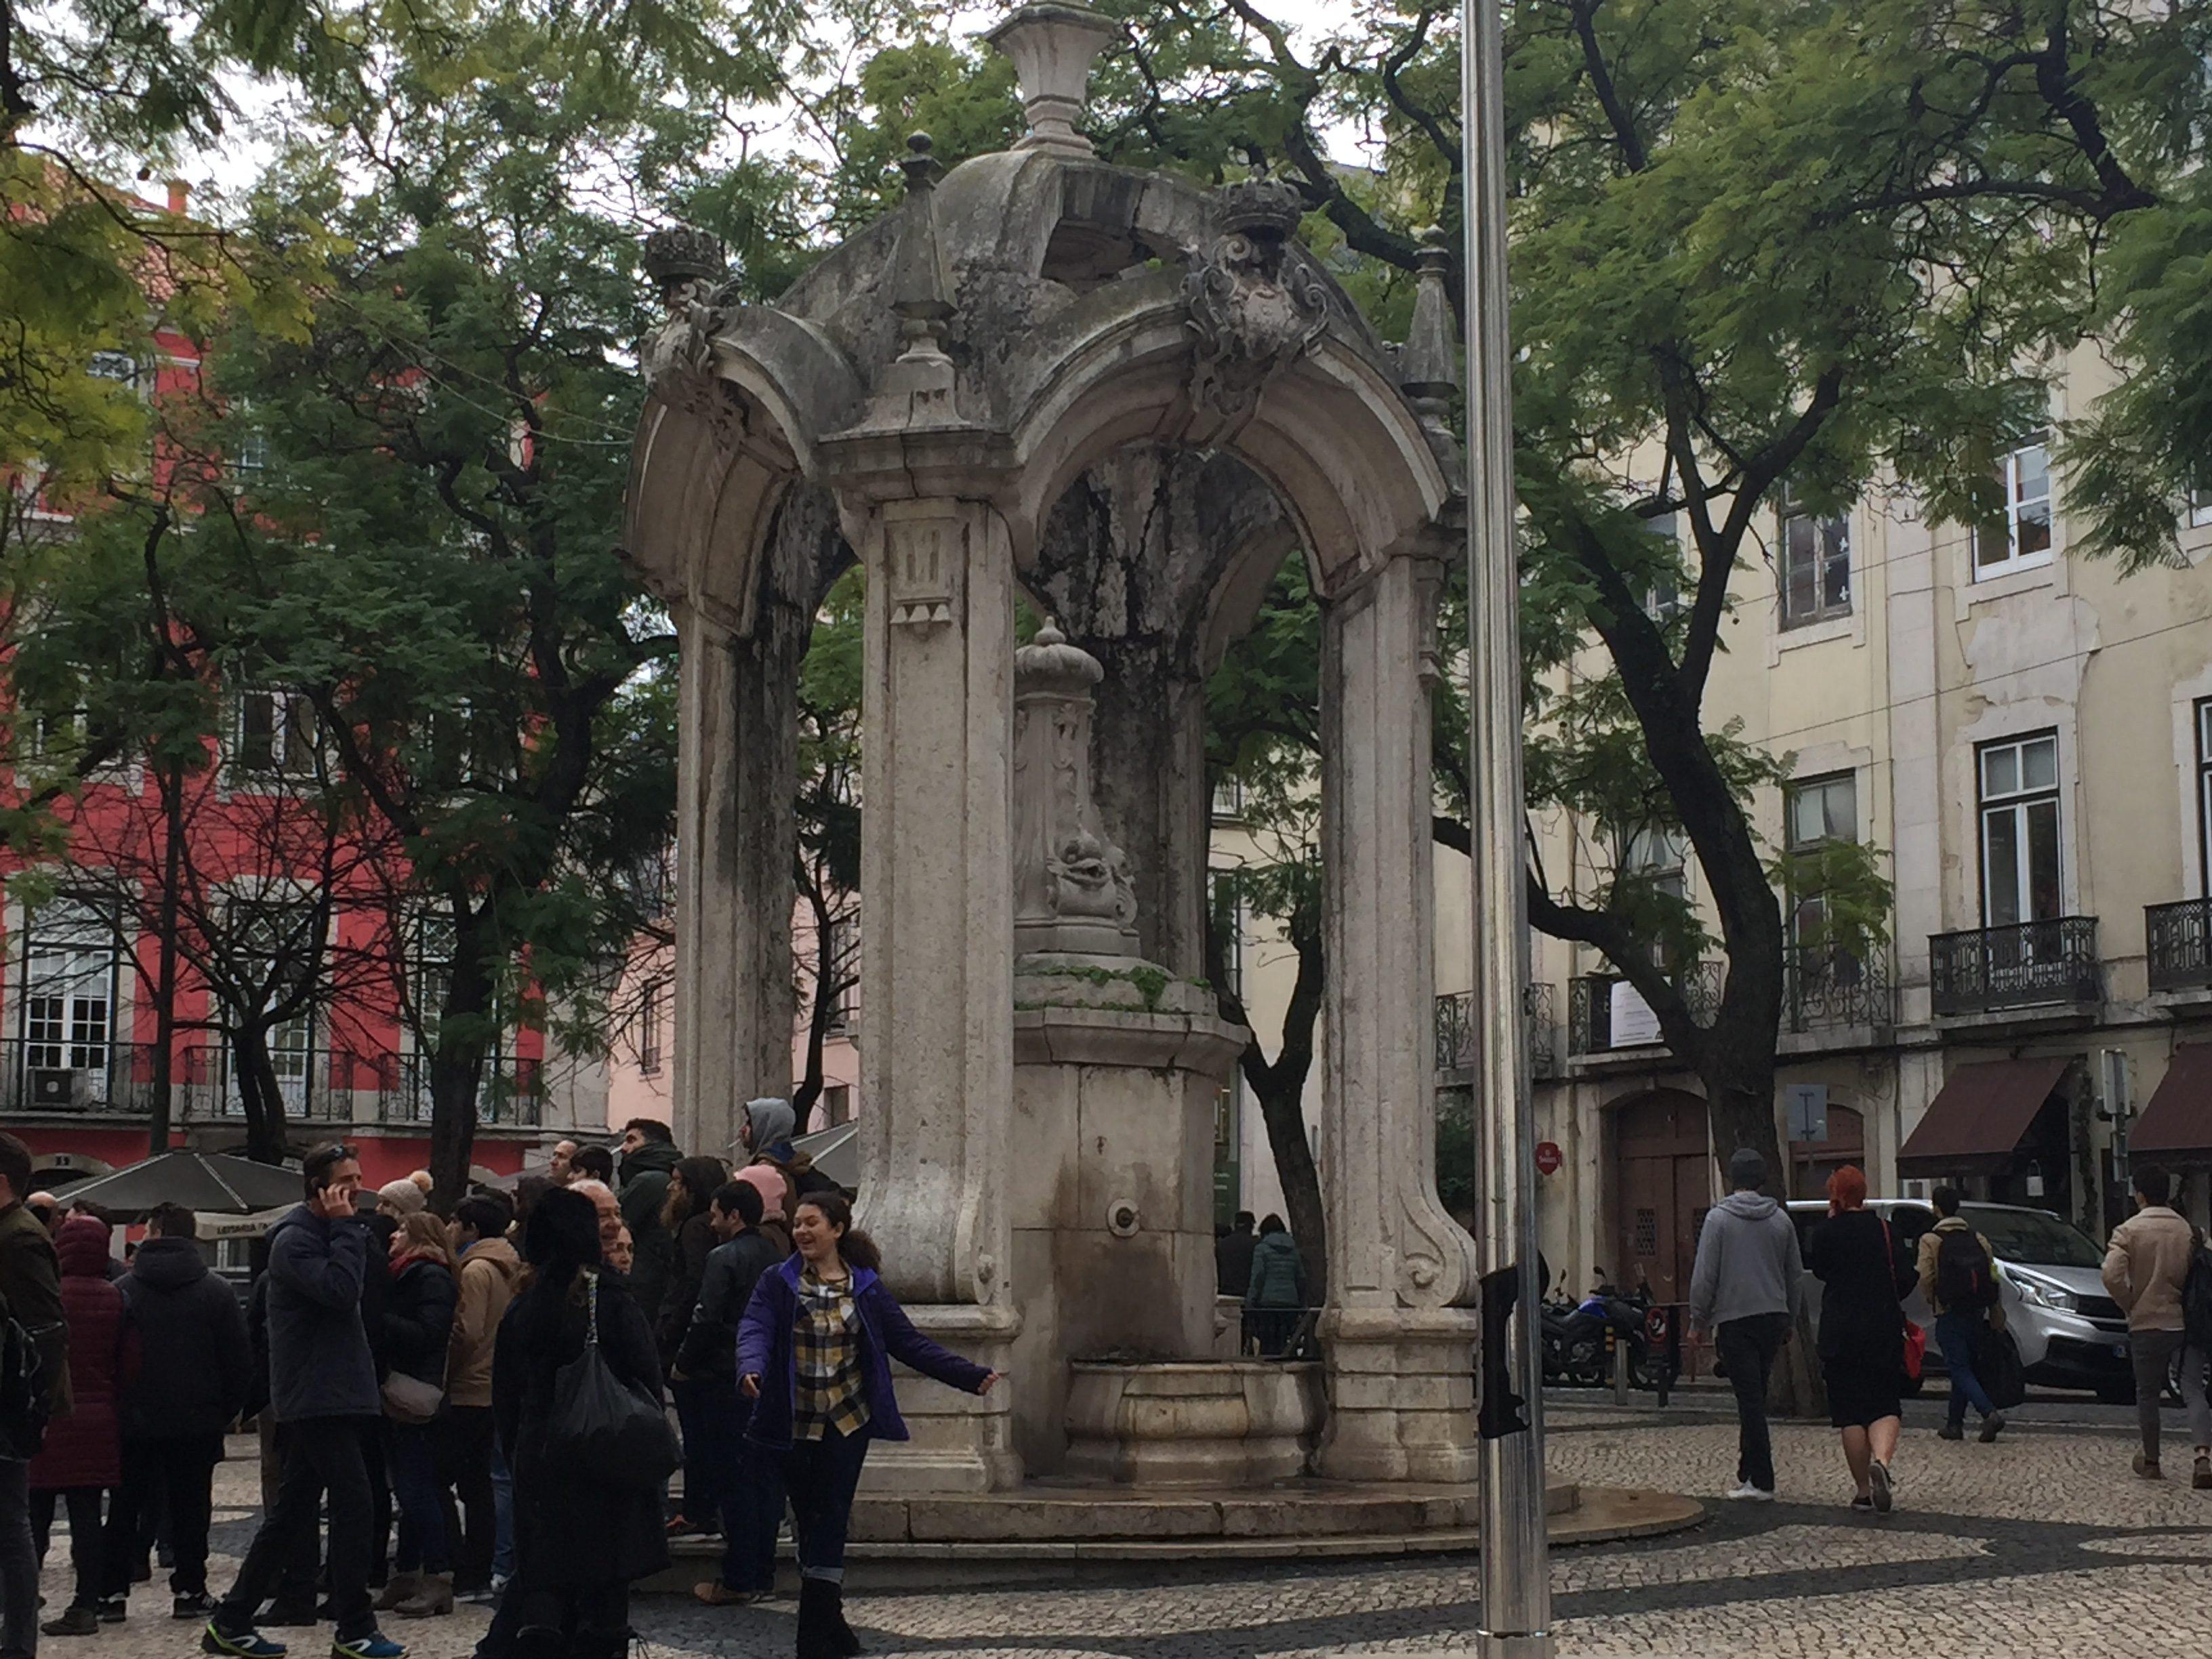 IMG 23071 e1515637205500 - Lugares para visitar en Lisboa (Parte II/II)